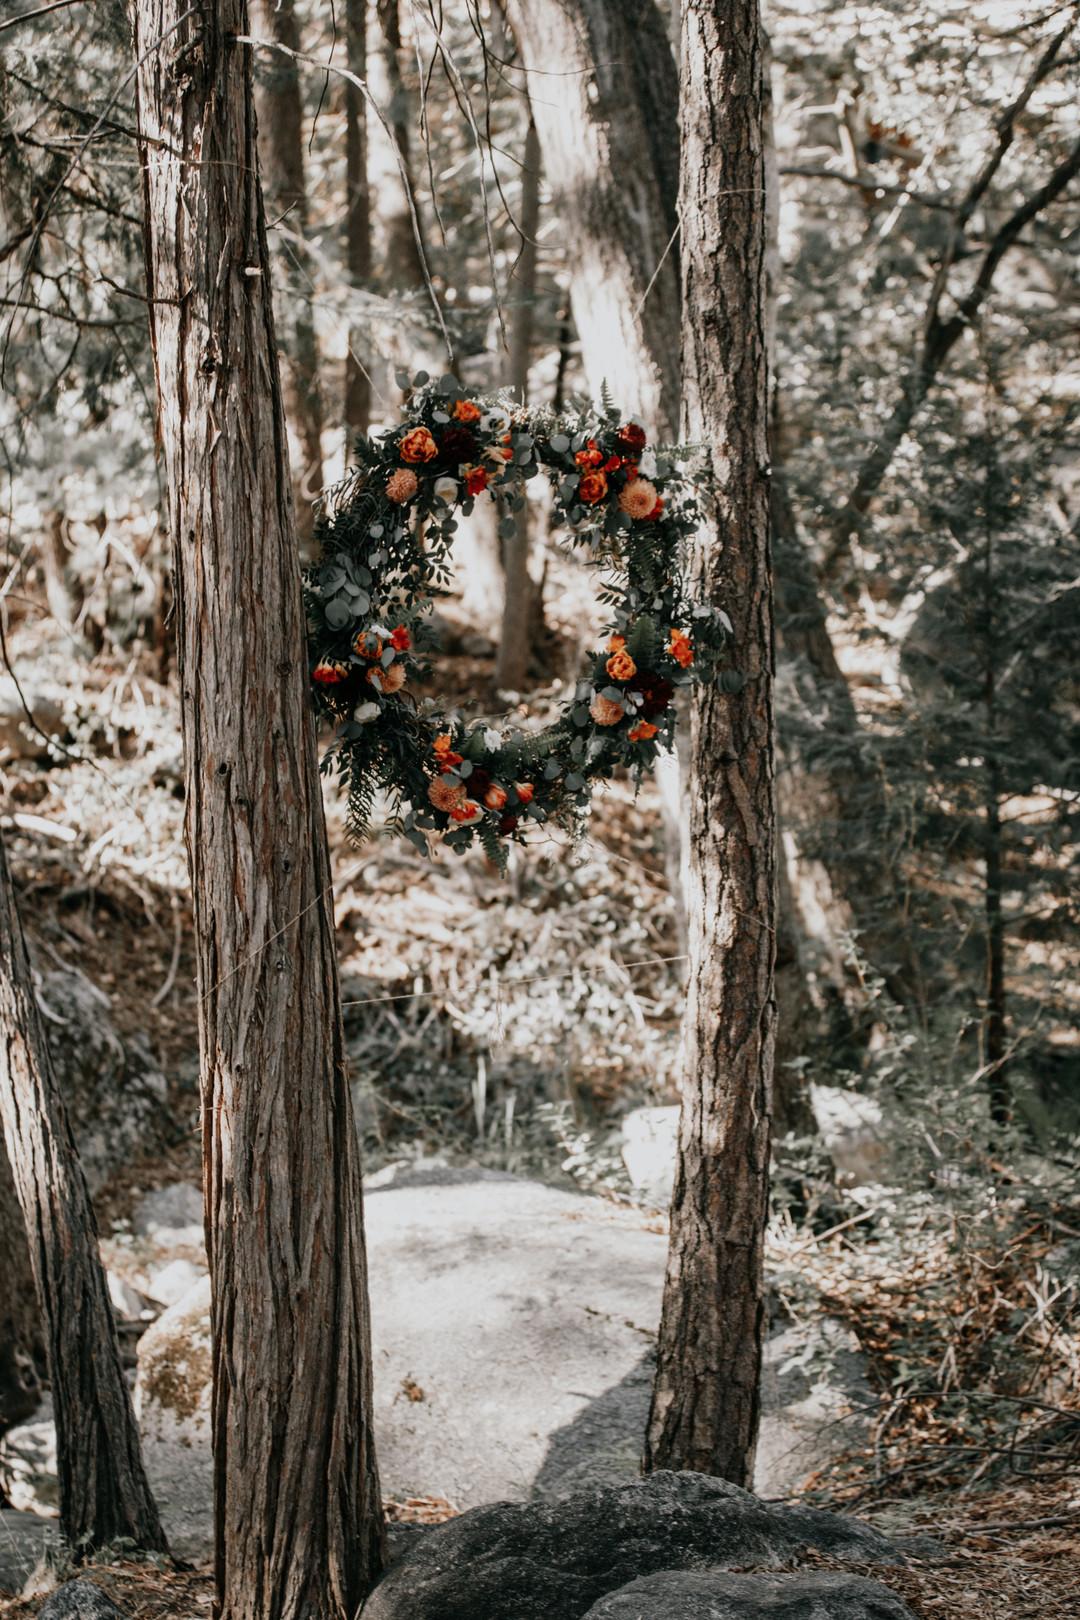 Wedding in the woods wedding arch